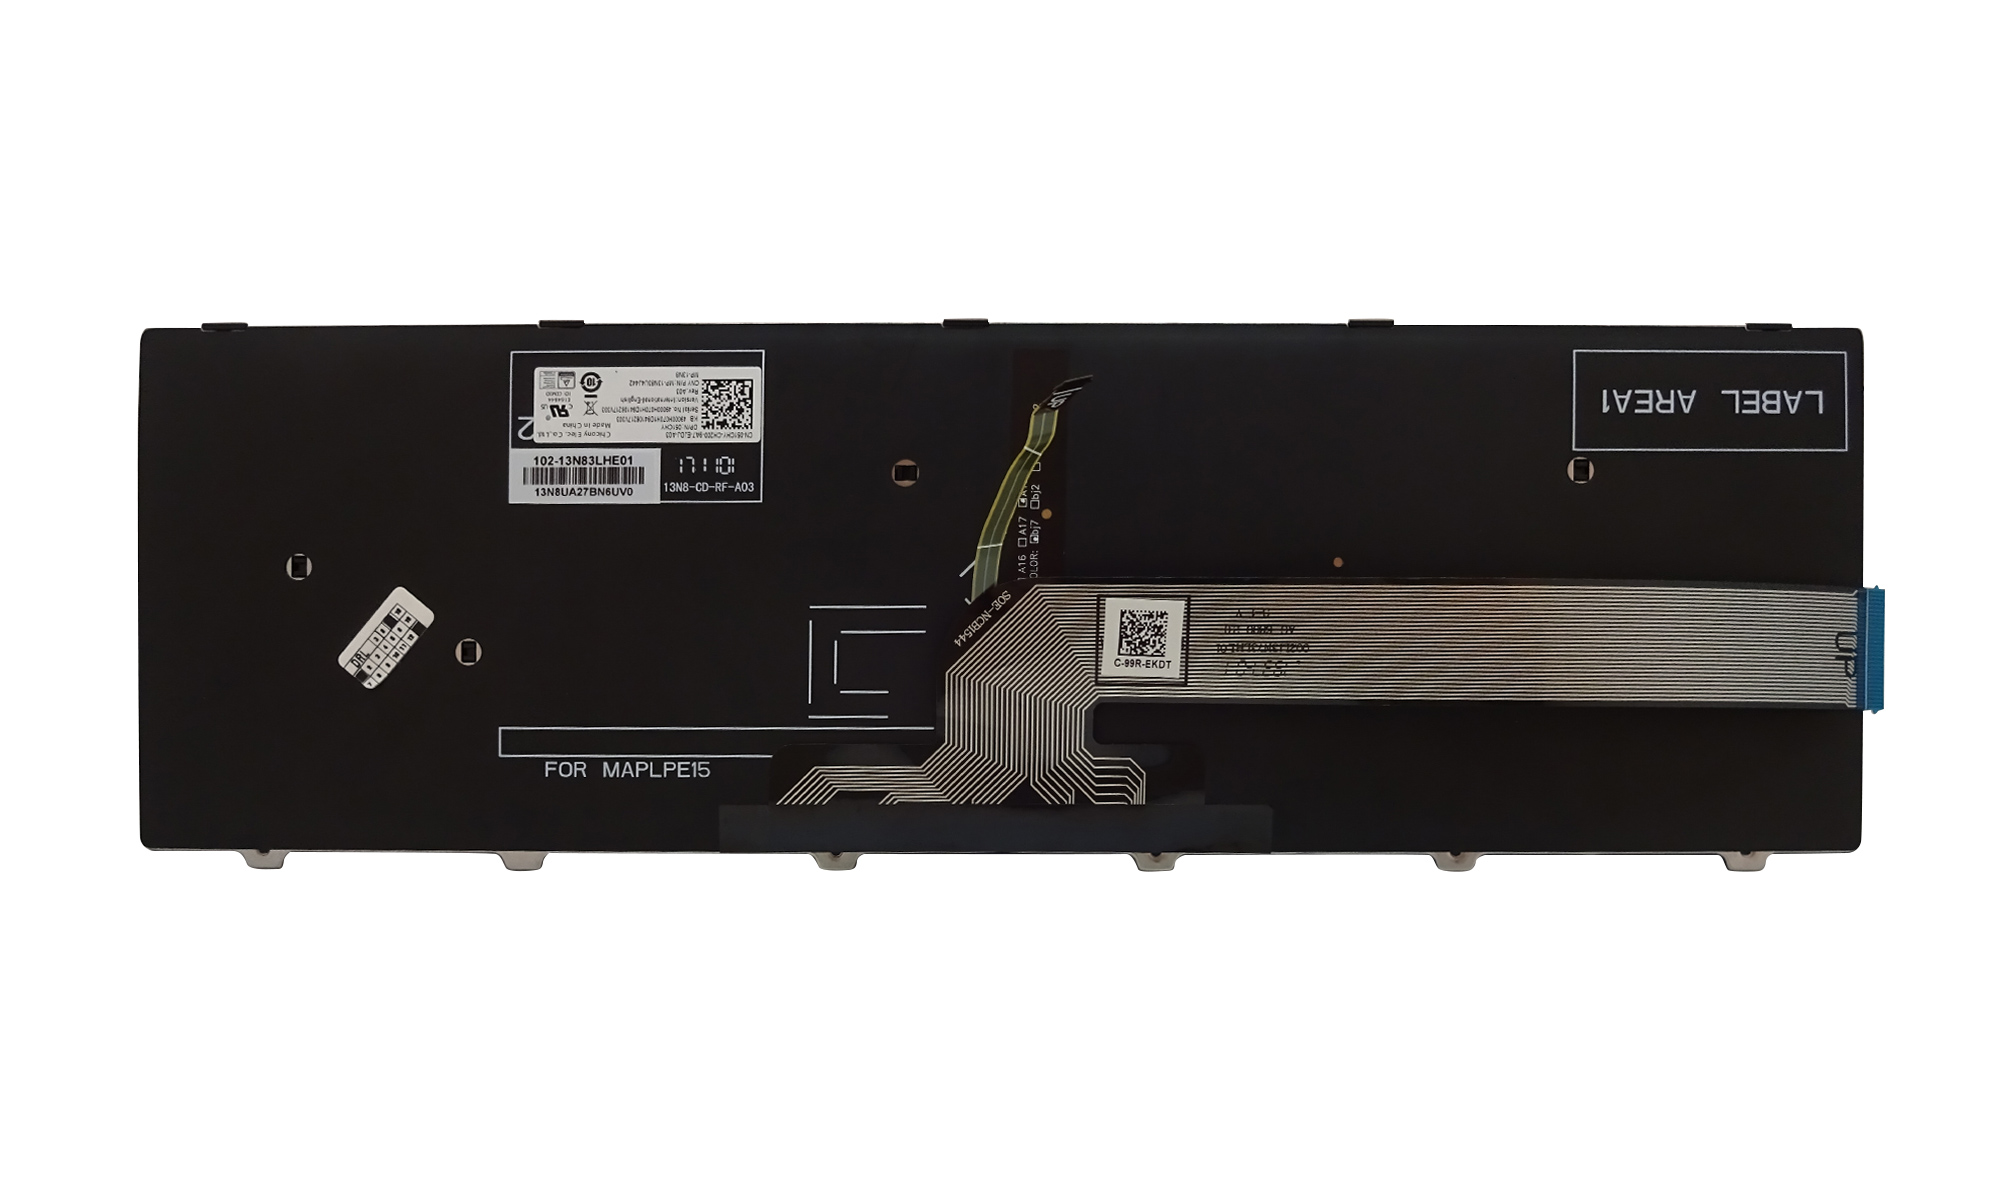 Tastatura originala Dell Inspiron 5758, 5759, 7557, 7559, neagra, cu iluminare, layout US, model 51CHY